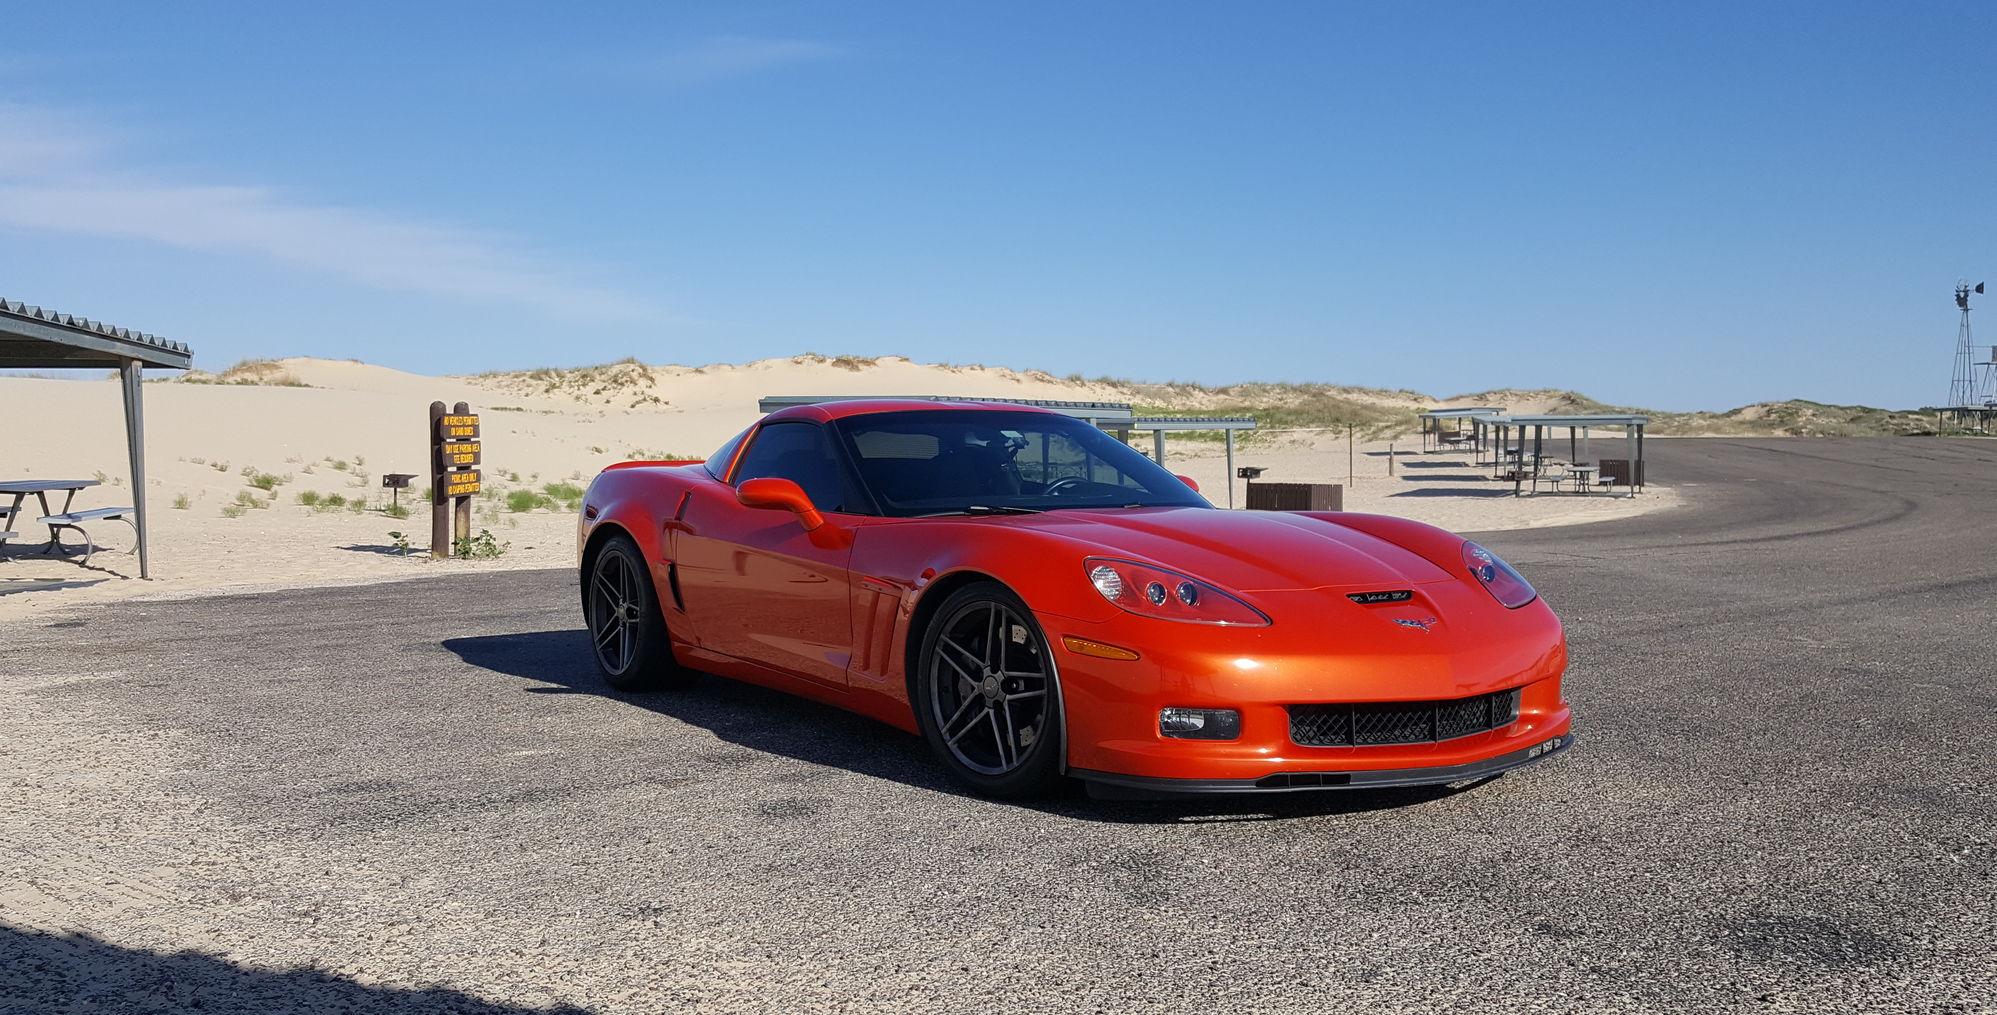 centenial grand sport corvette for sale autos post. Black Bedroom Furniture Sets. Home Design Ideas